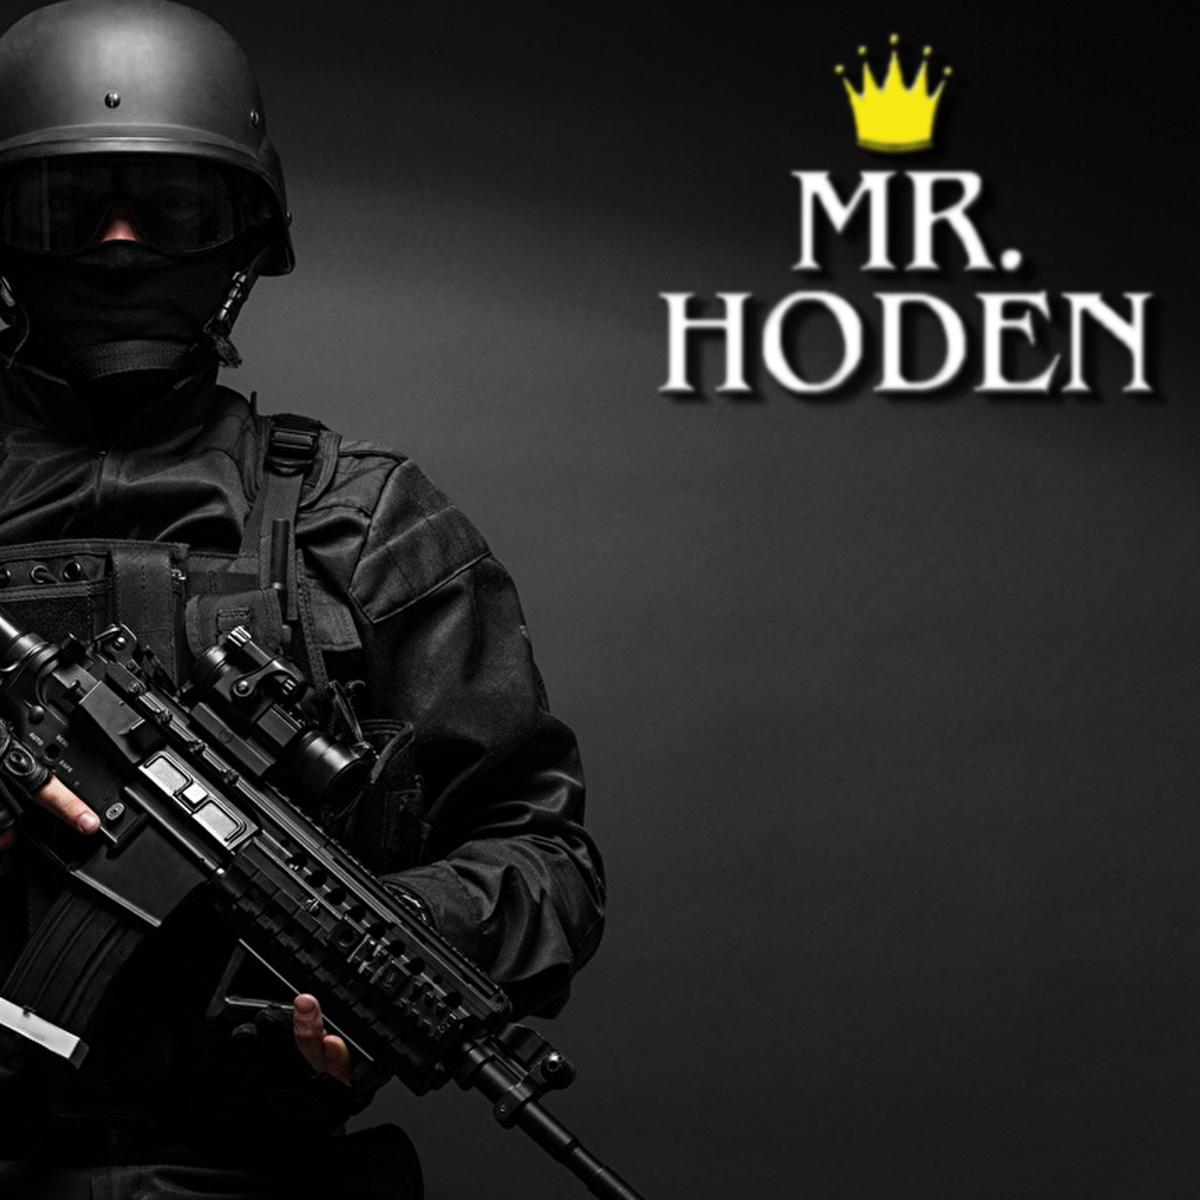 Upcoming: Mr. Hoden - Mighty Hard Rap Beat 2020 [FREE BEAT]